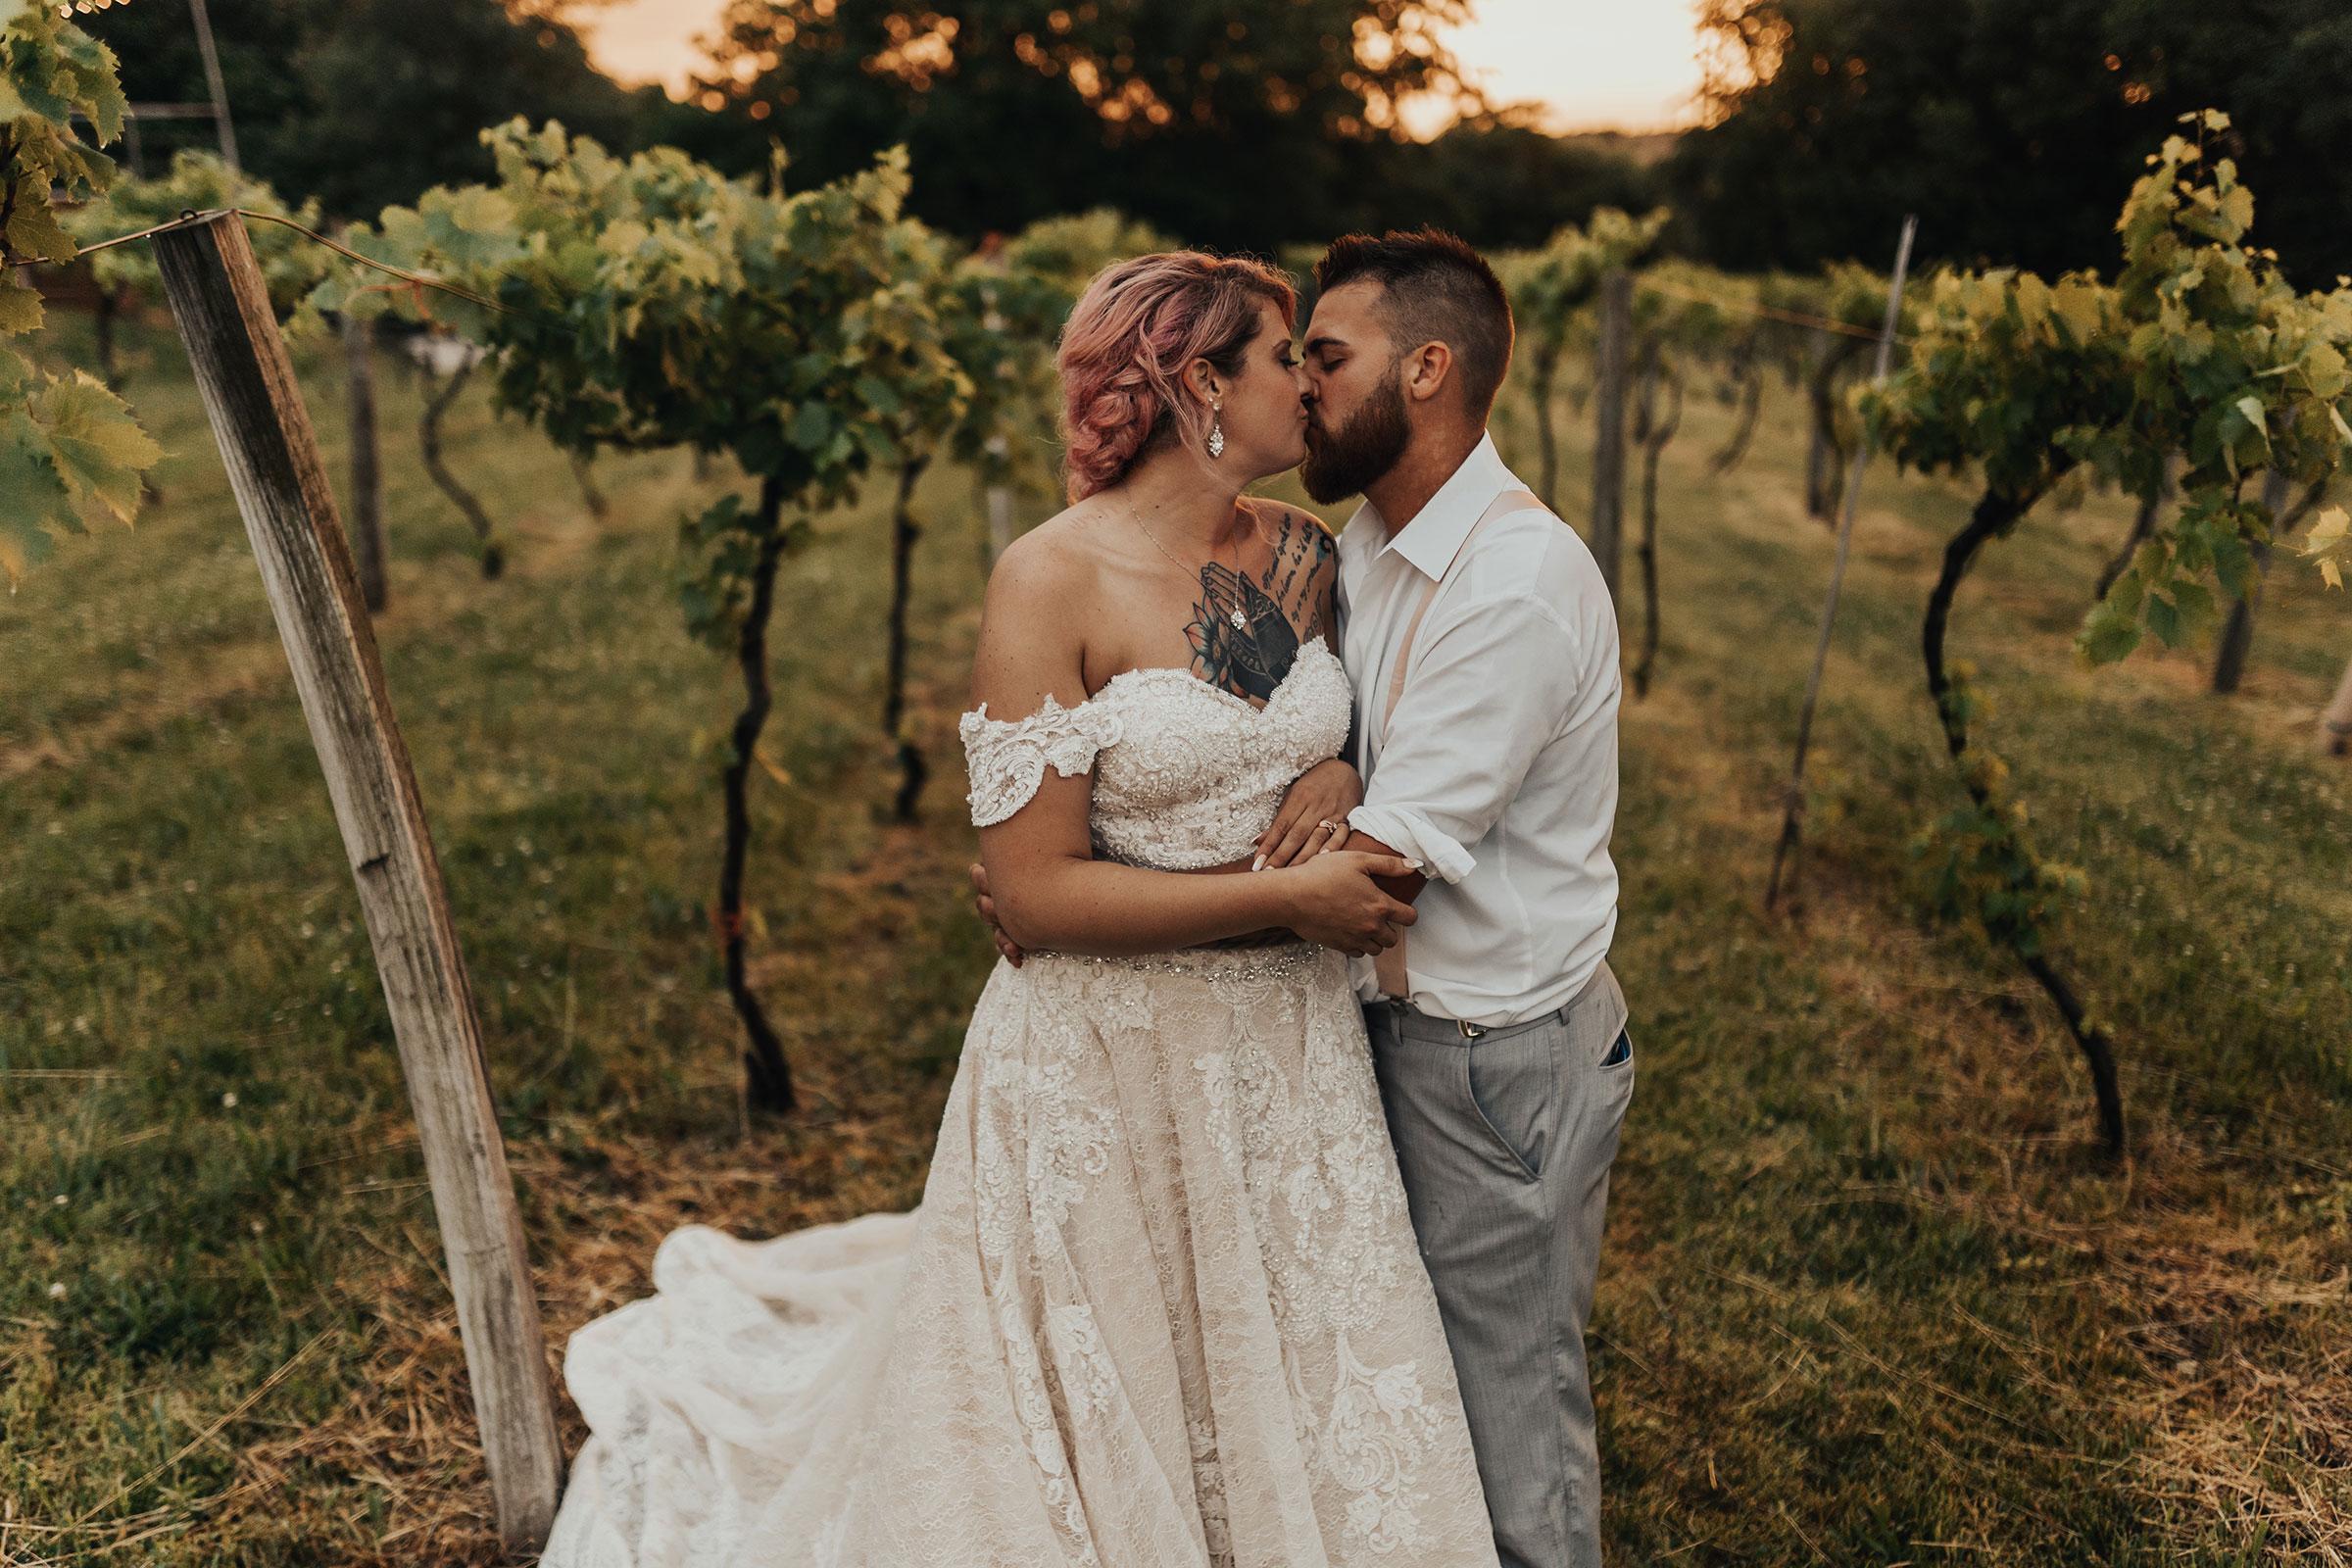 bride-groom-kissing-in-vineyard-wedding-summerset-winery-indianola-iowa-raelyn-ramey-photography.jpg